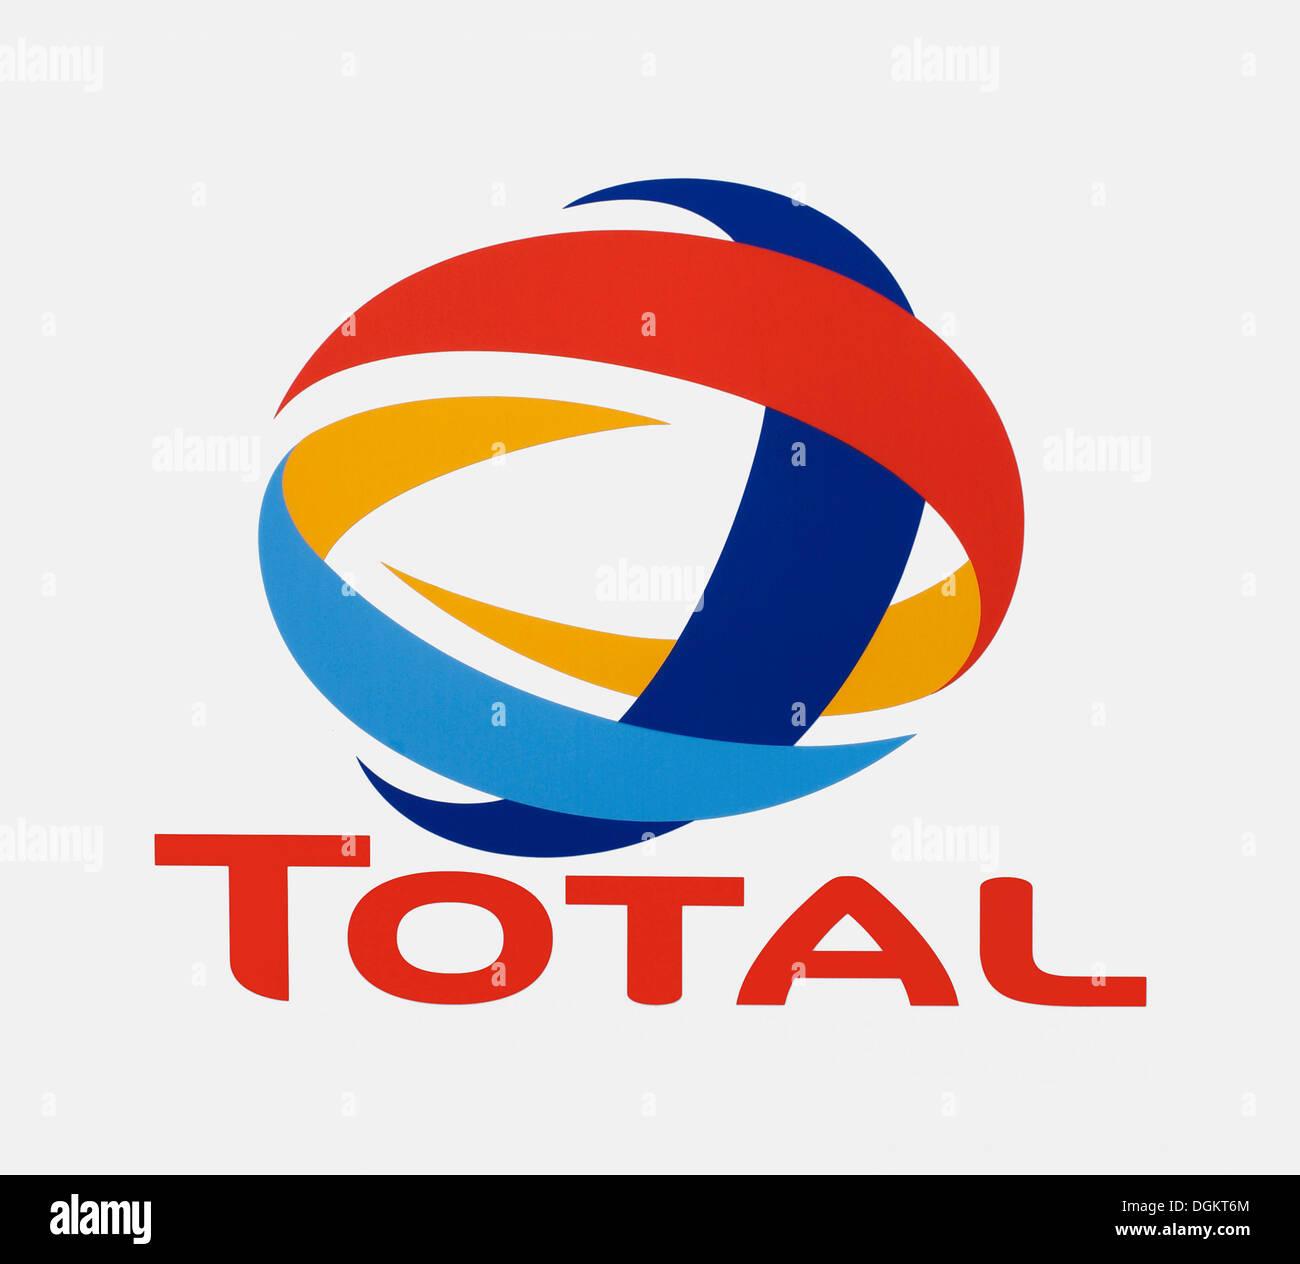 Total Logo Stockfotos & Total Logo Bilder - Alamy